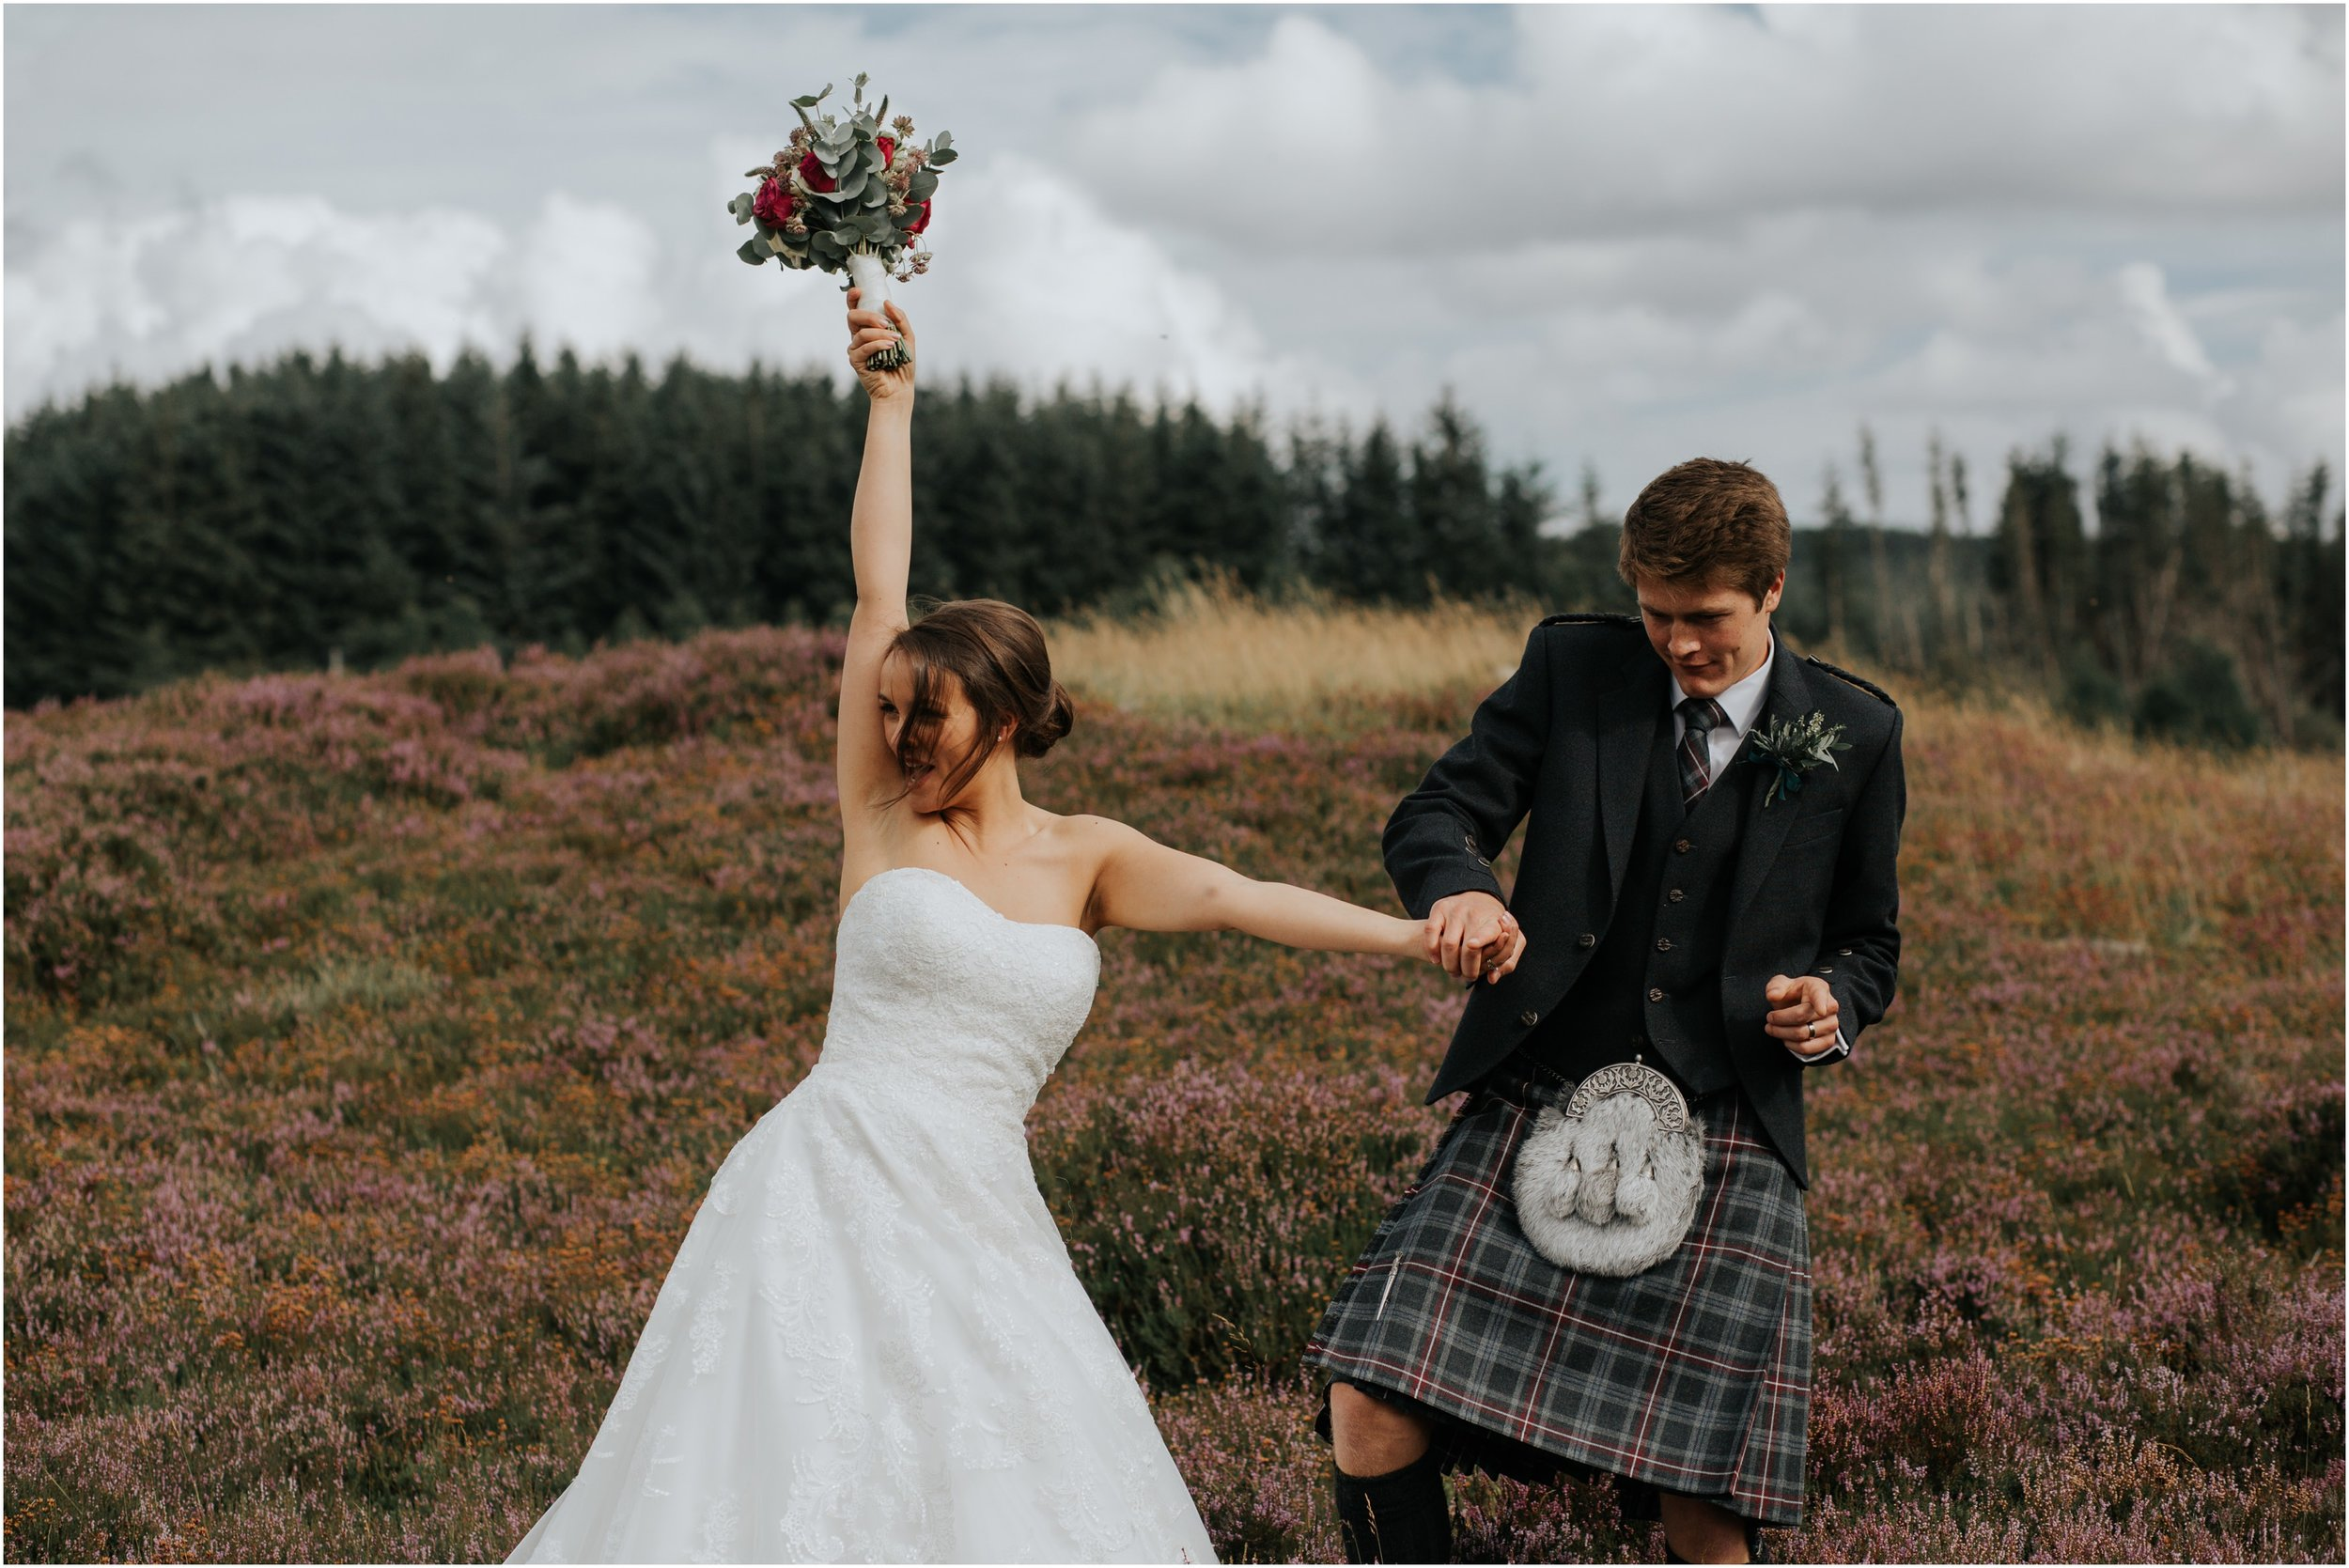 Photography 78 - Glasgow Wedding Photographer - Year in Reveiw_0005.jpg